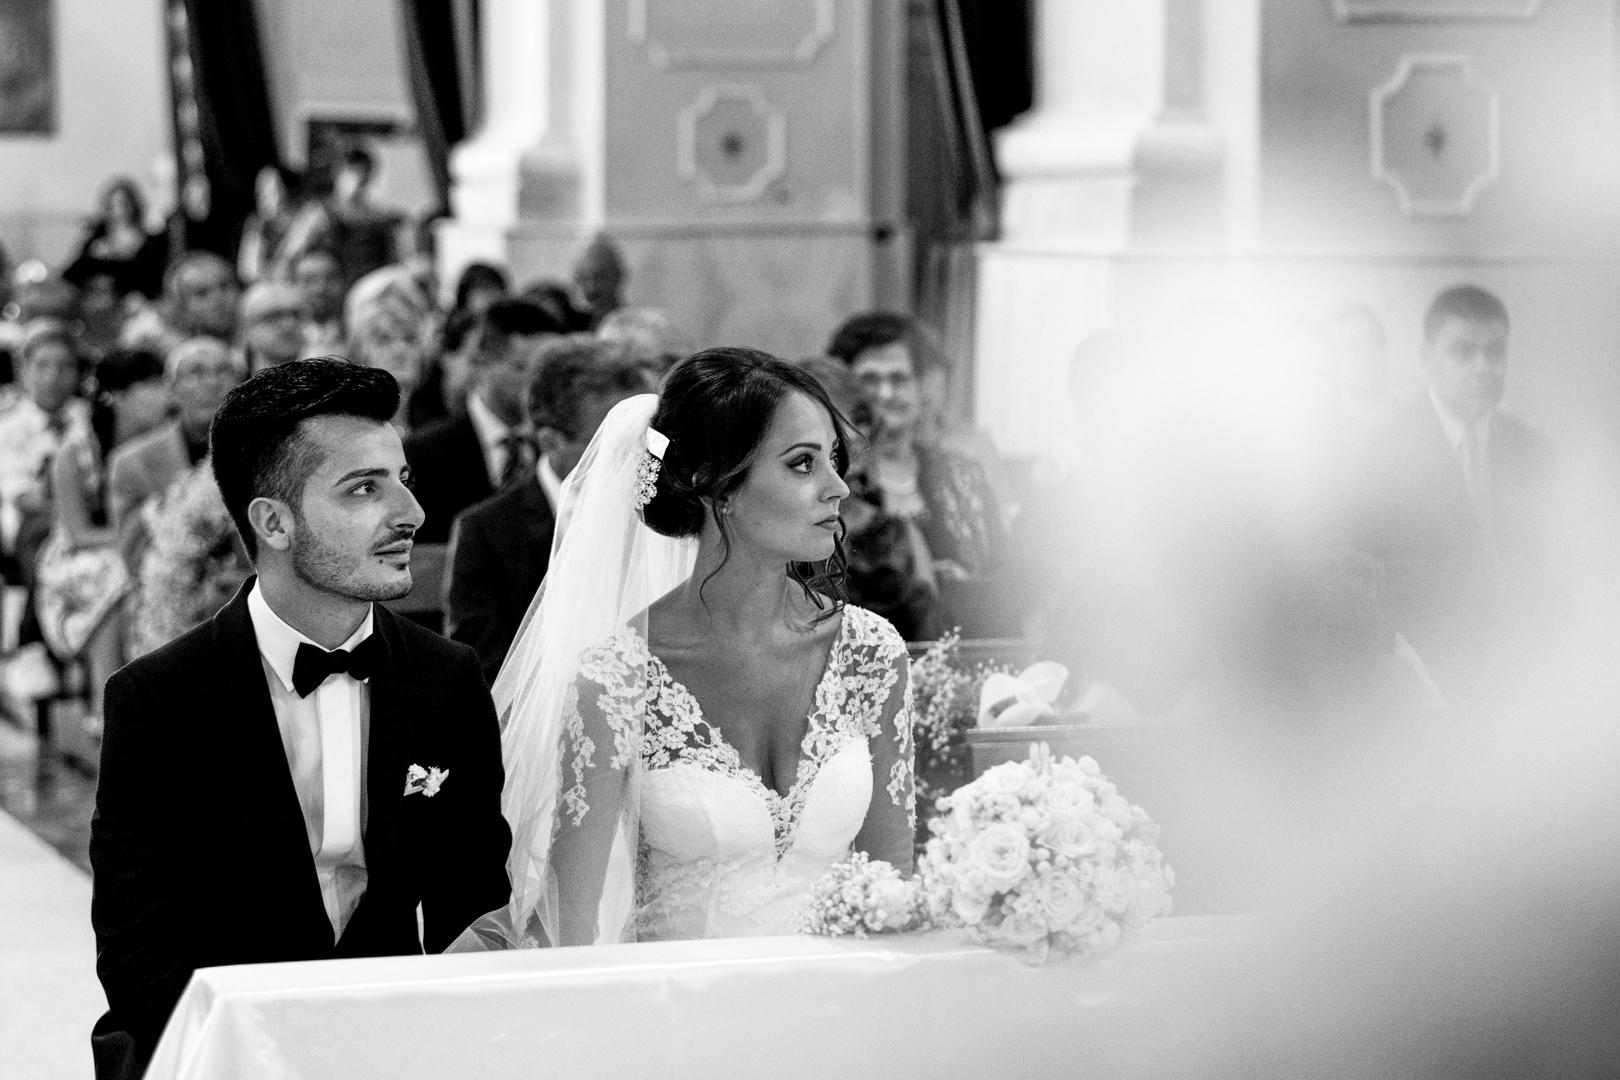 14 gianni-lepore-matrimonio-chiesa-stornara-bianco-nero